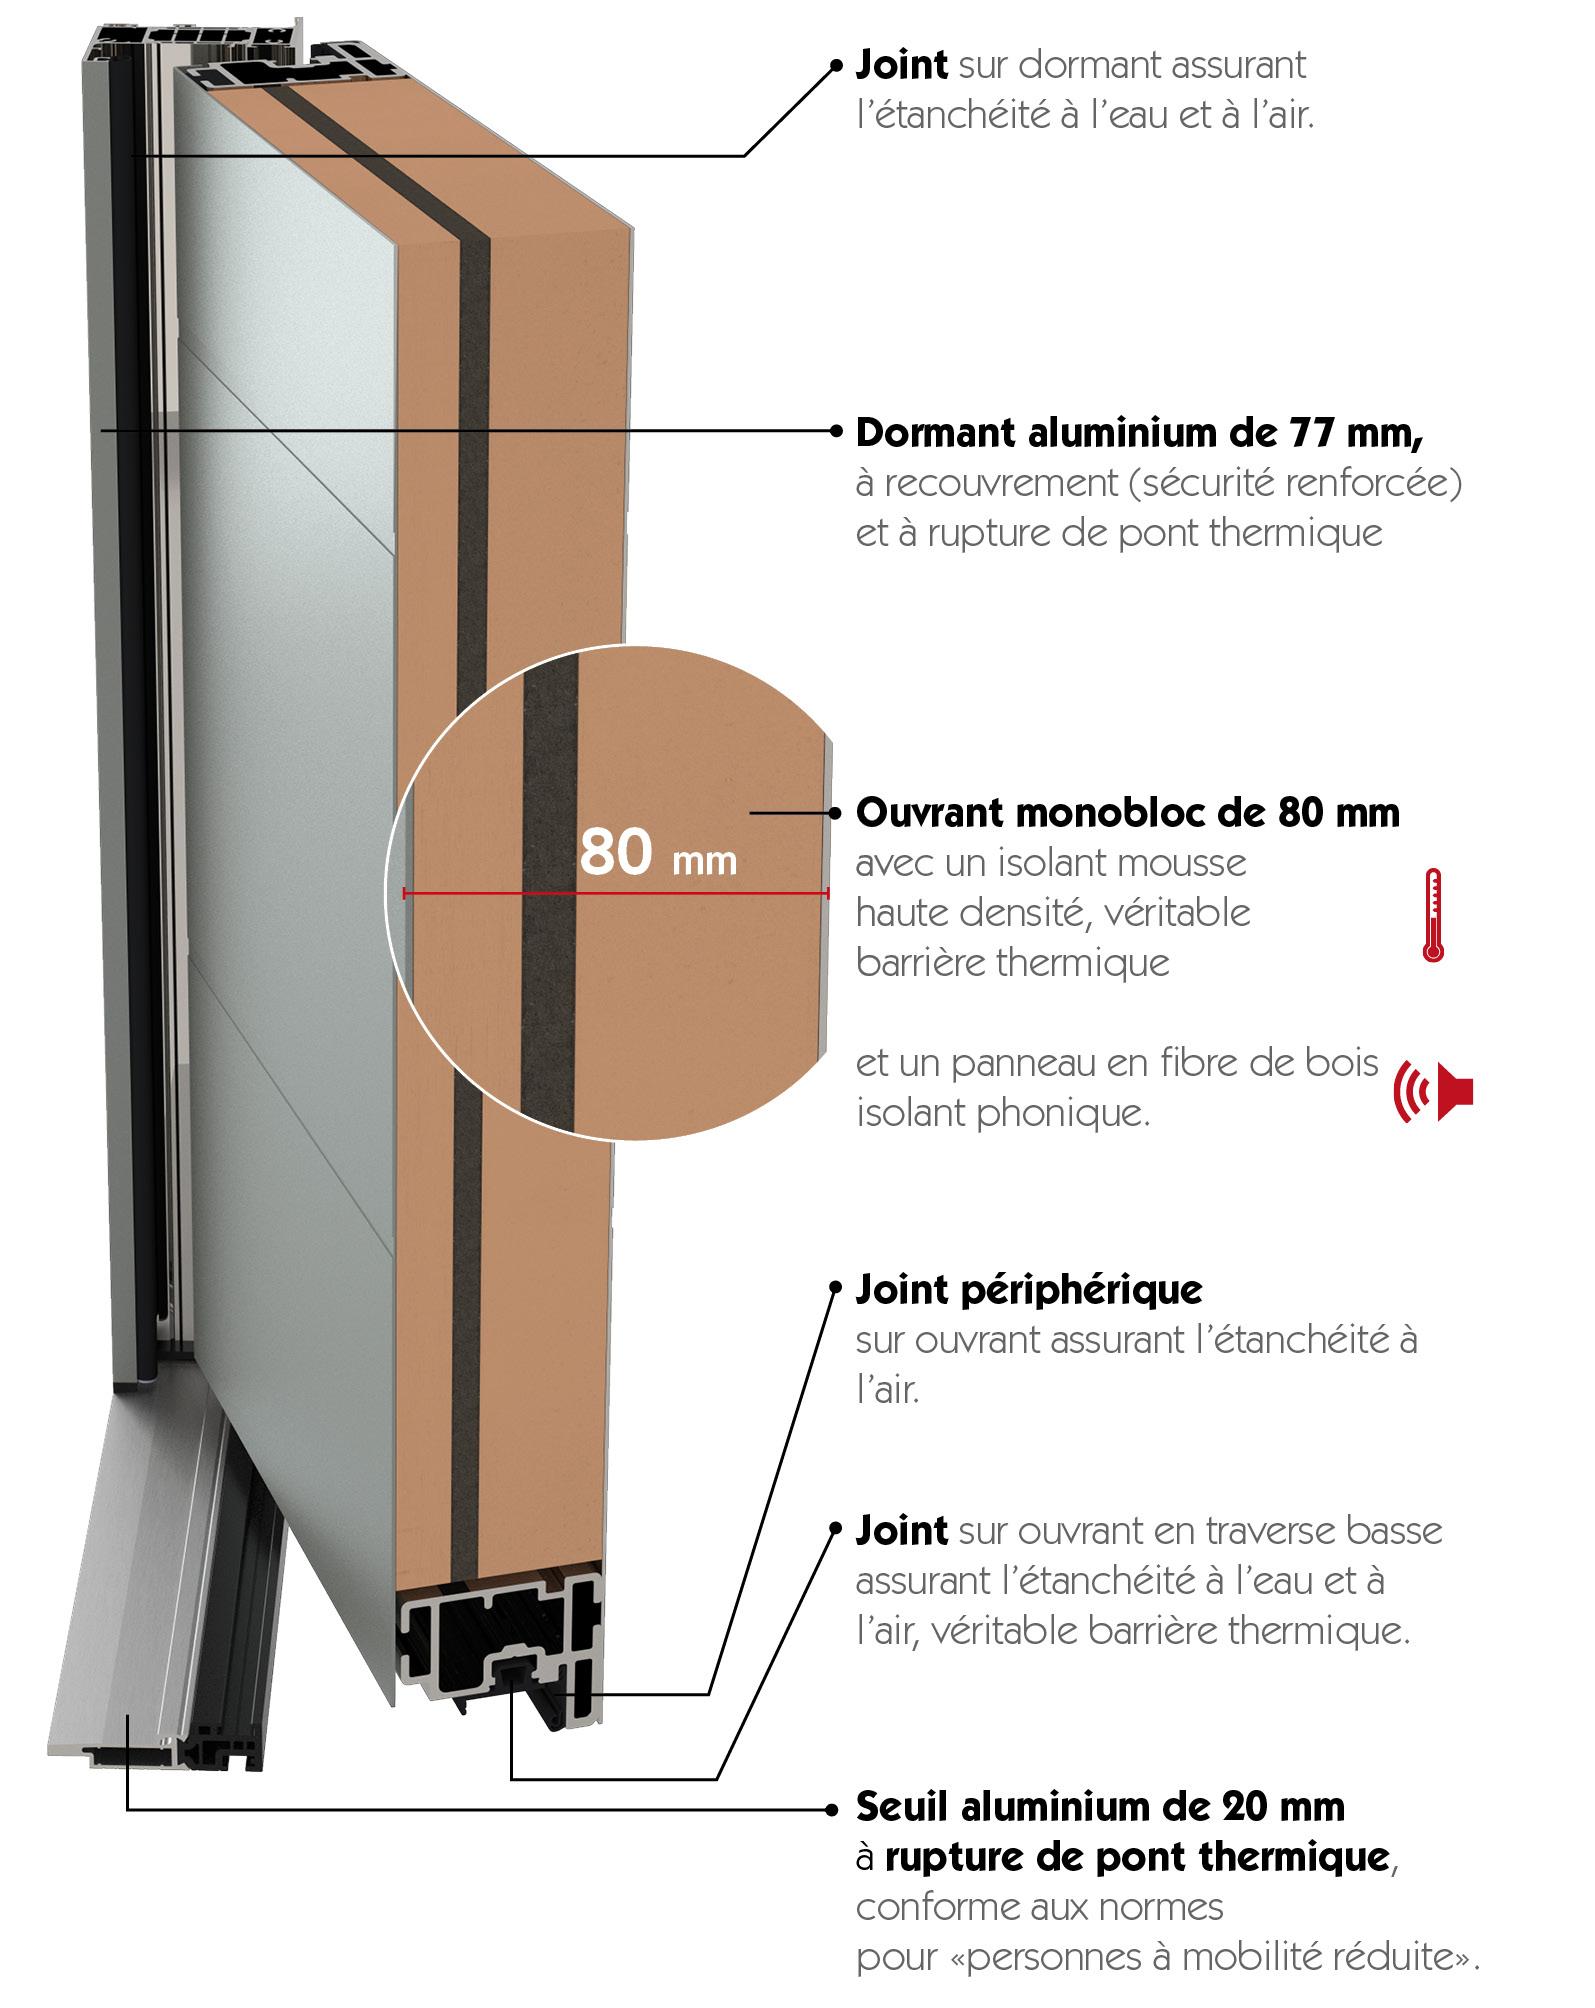 2_belm Porte Dentree Aluminium Langeais Conception ...